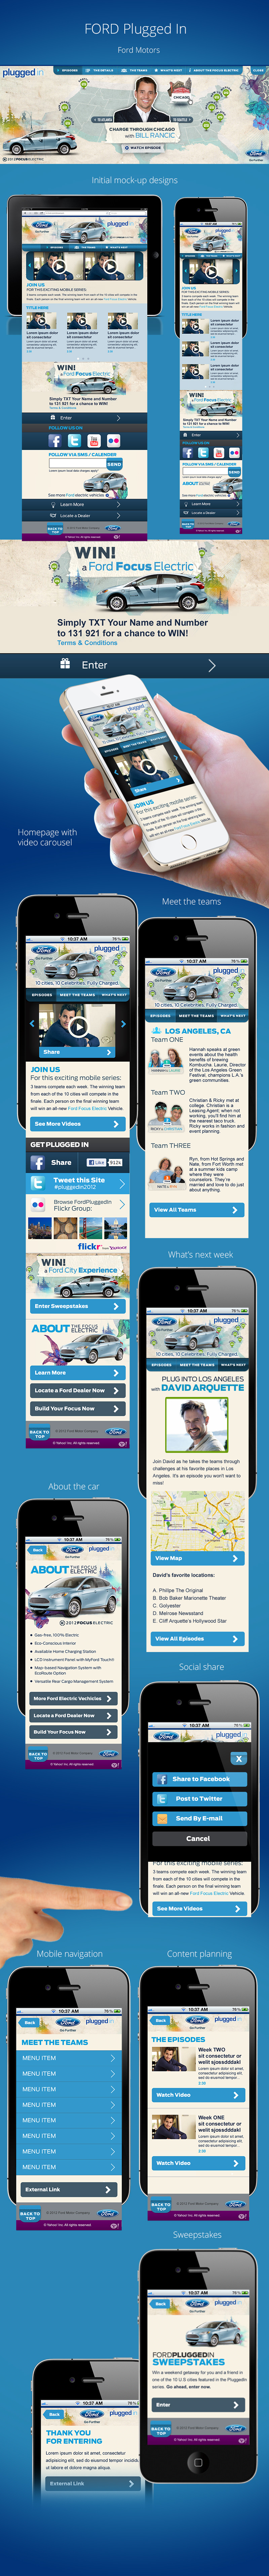 Mobile Social Video Marketing Sendinthefox Crypto Design Agency Defi Mobileux